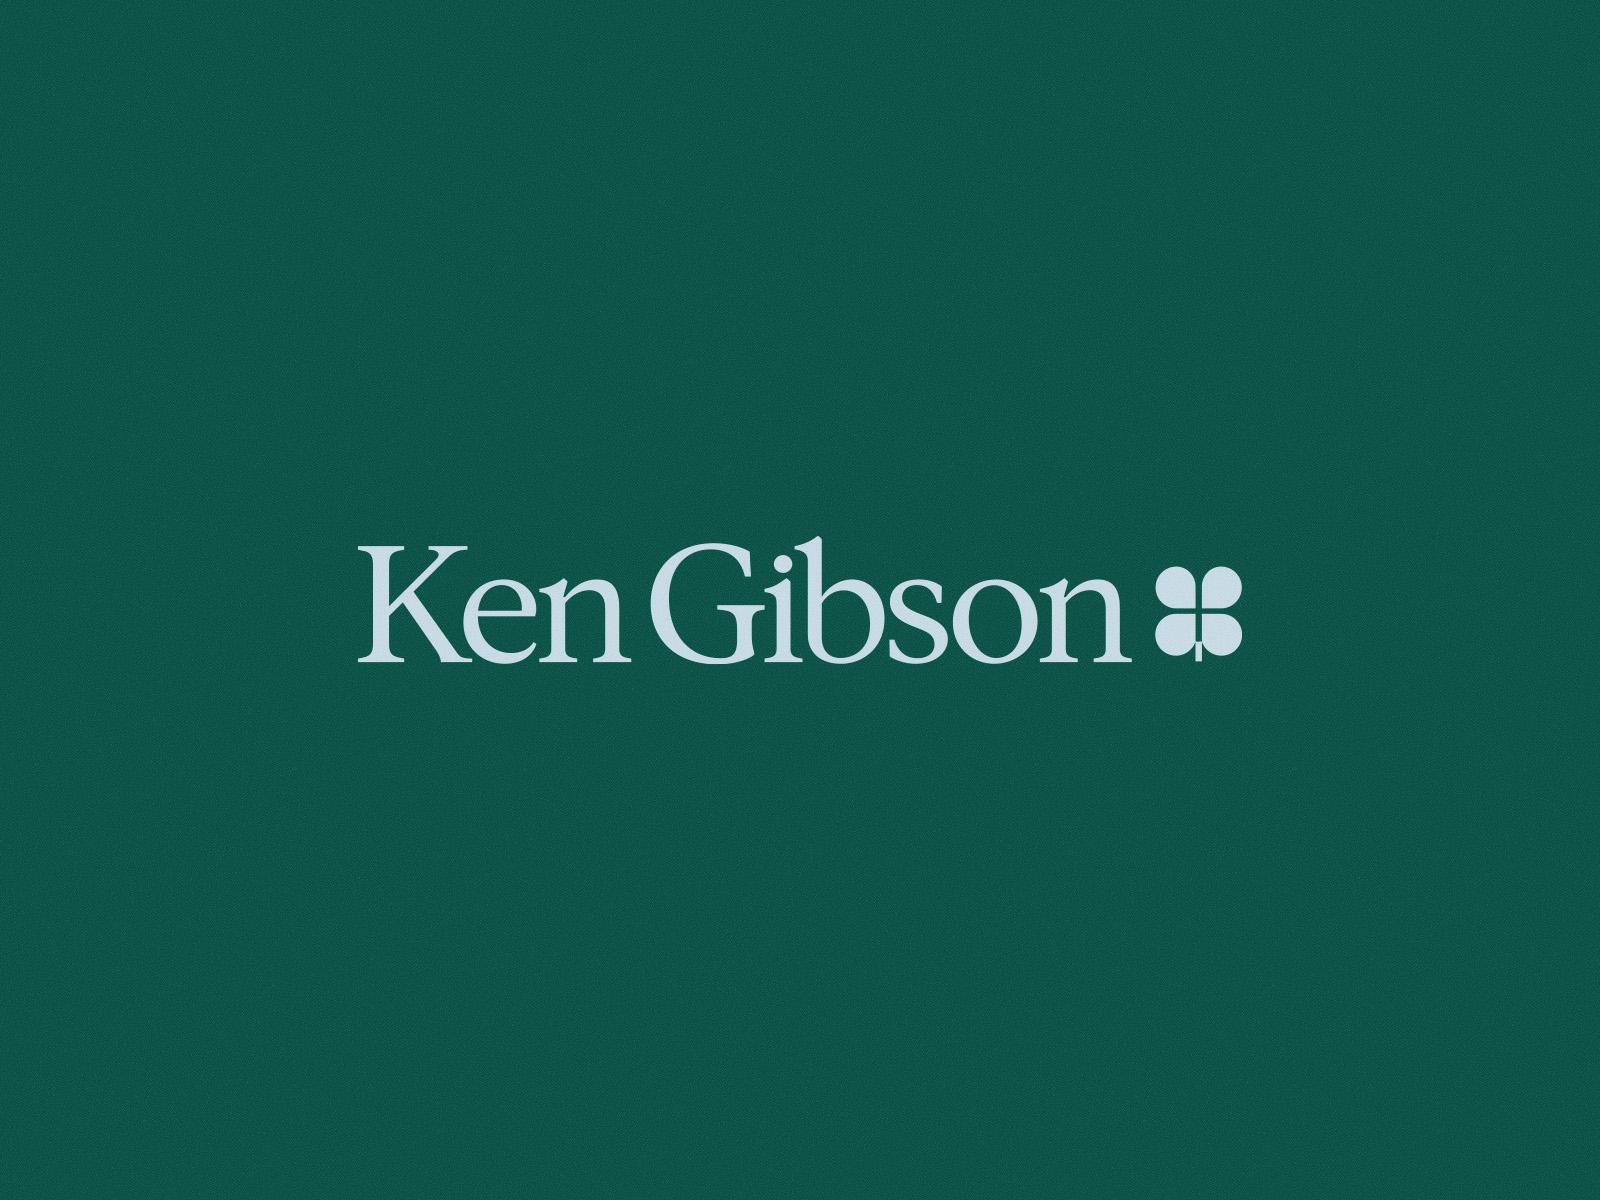 Ken Gibson | Brand Identity 🍀